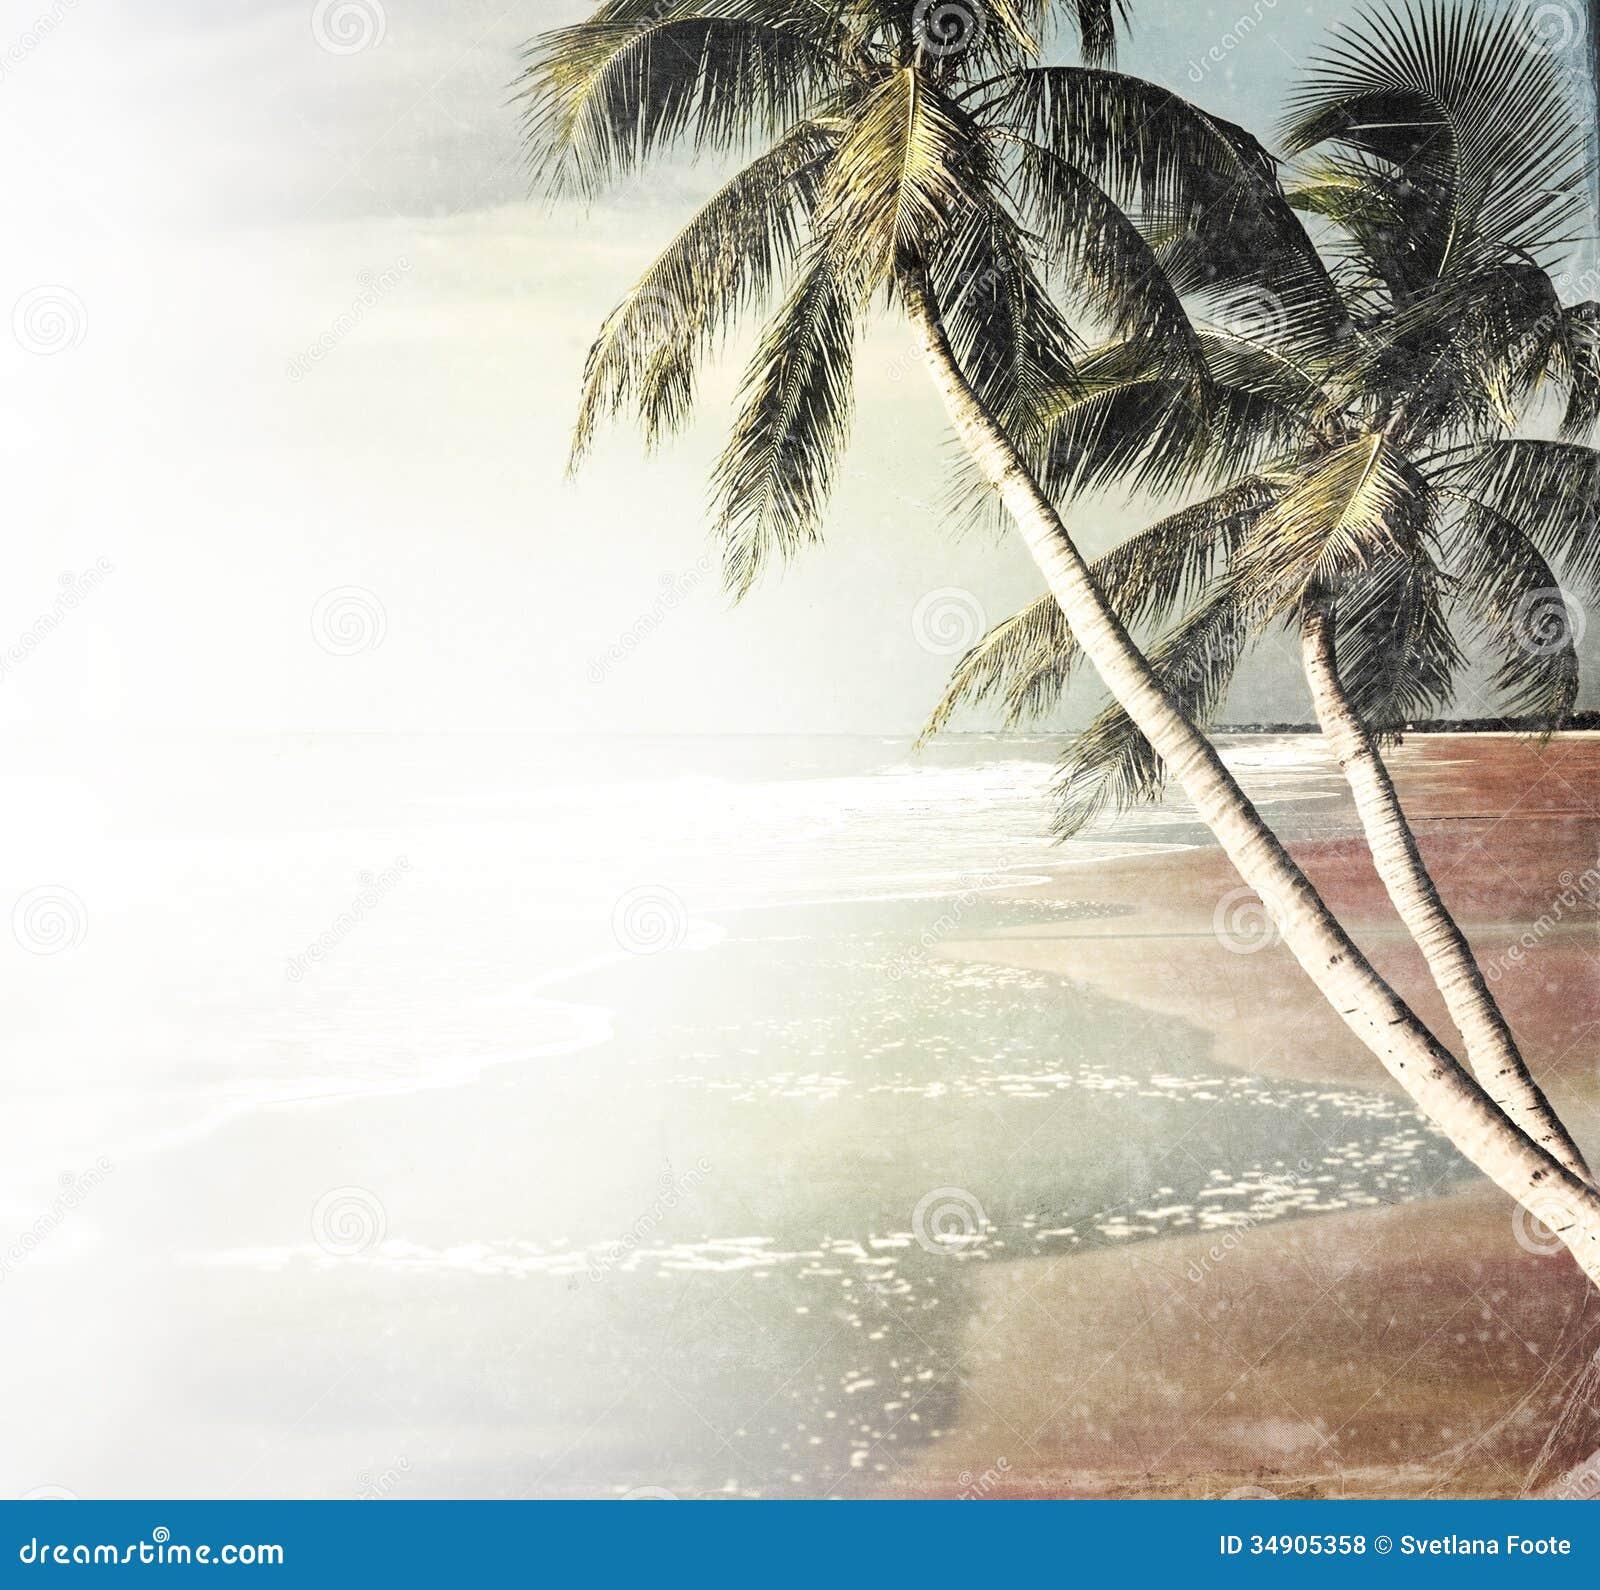 Vintage Beach Background Stock Photo 112981333: Vintage Tropical Beach Background Royalty Free Stock